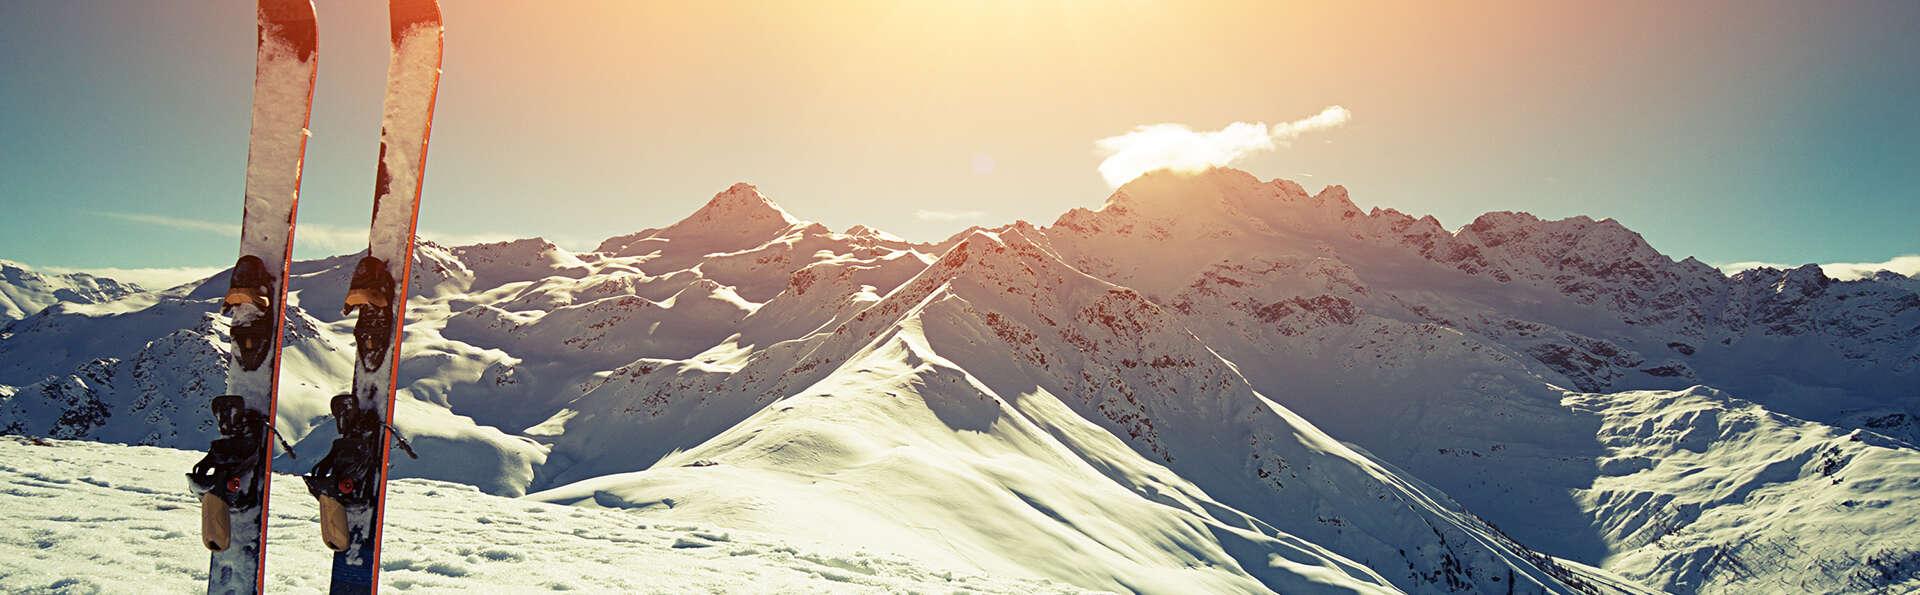 Résidence et Spa Vallorcine Mont-Blanc - EDIT_SKI04.jpg